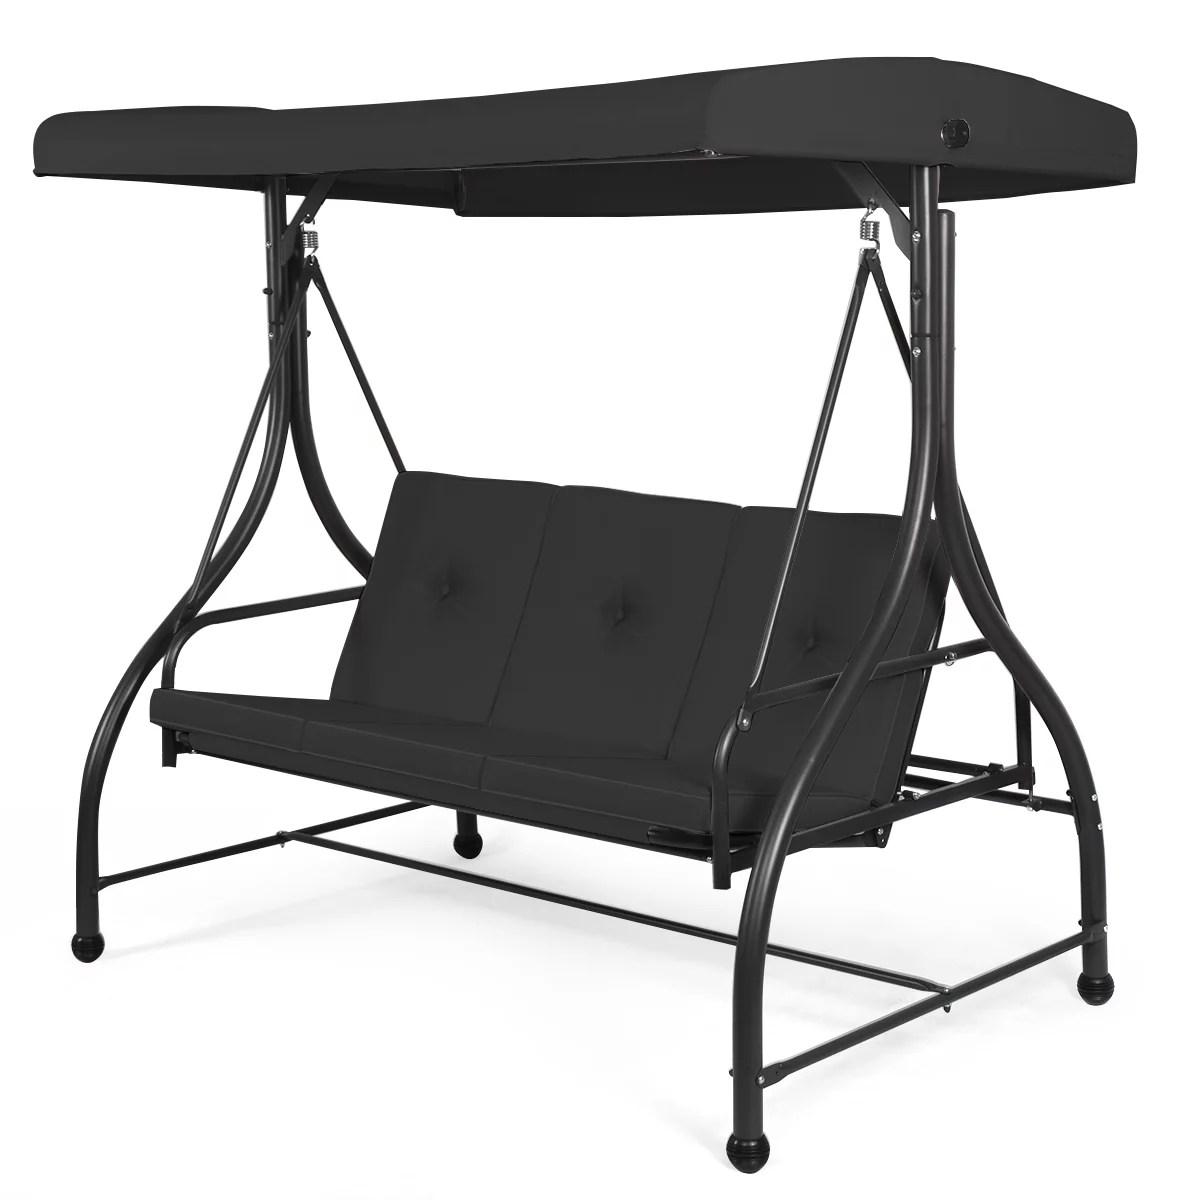 converting swing canopy hammock 3 seats patio deck furniture black